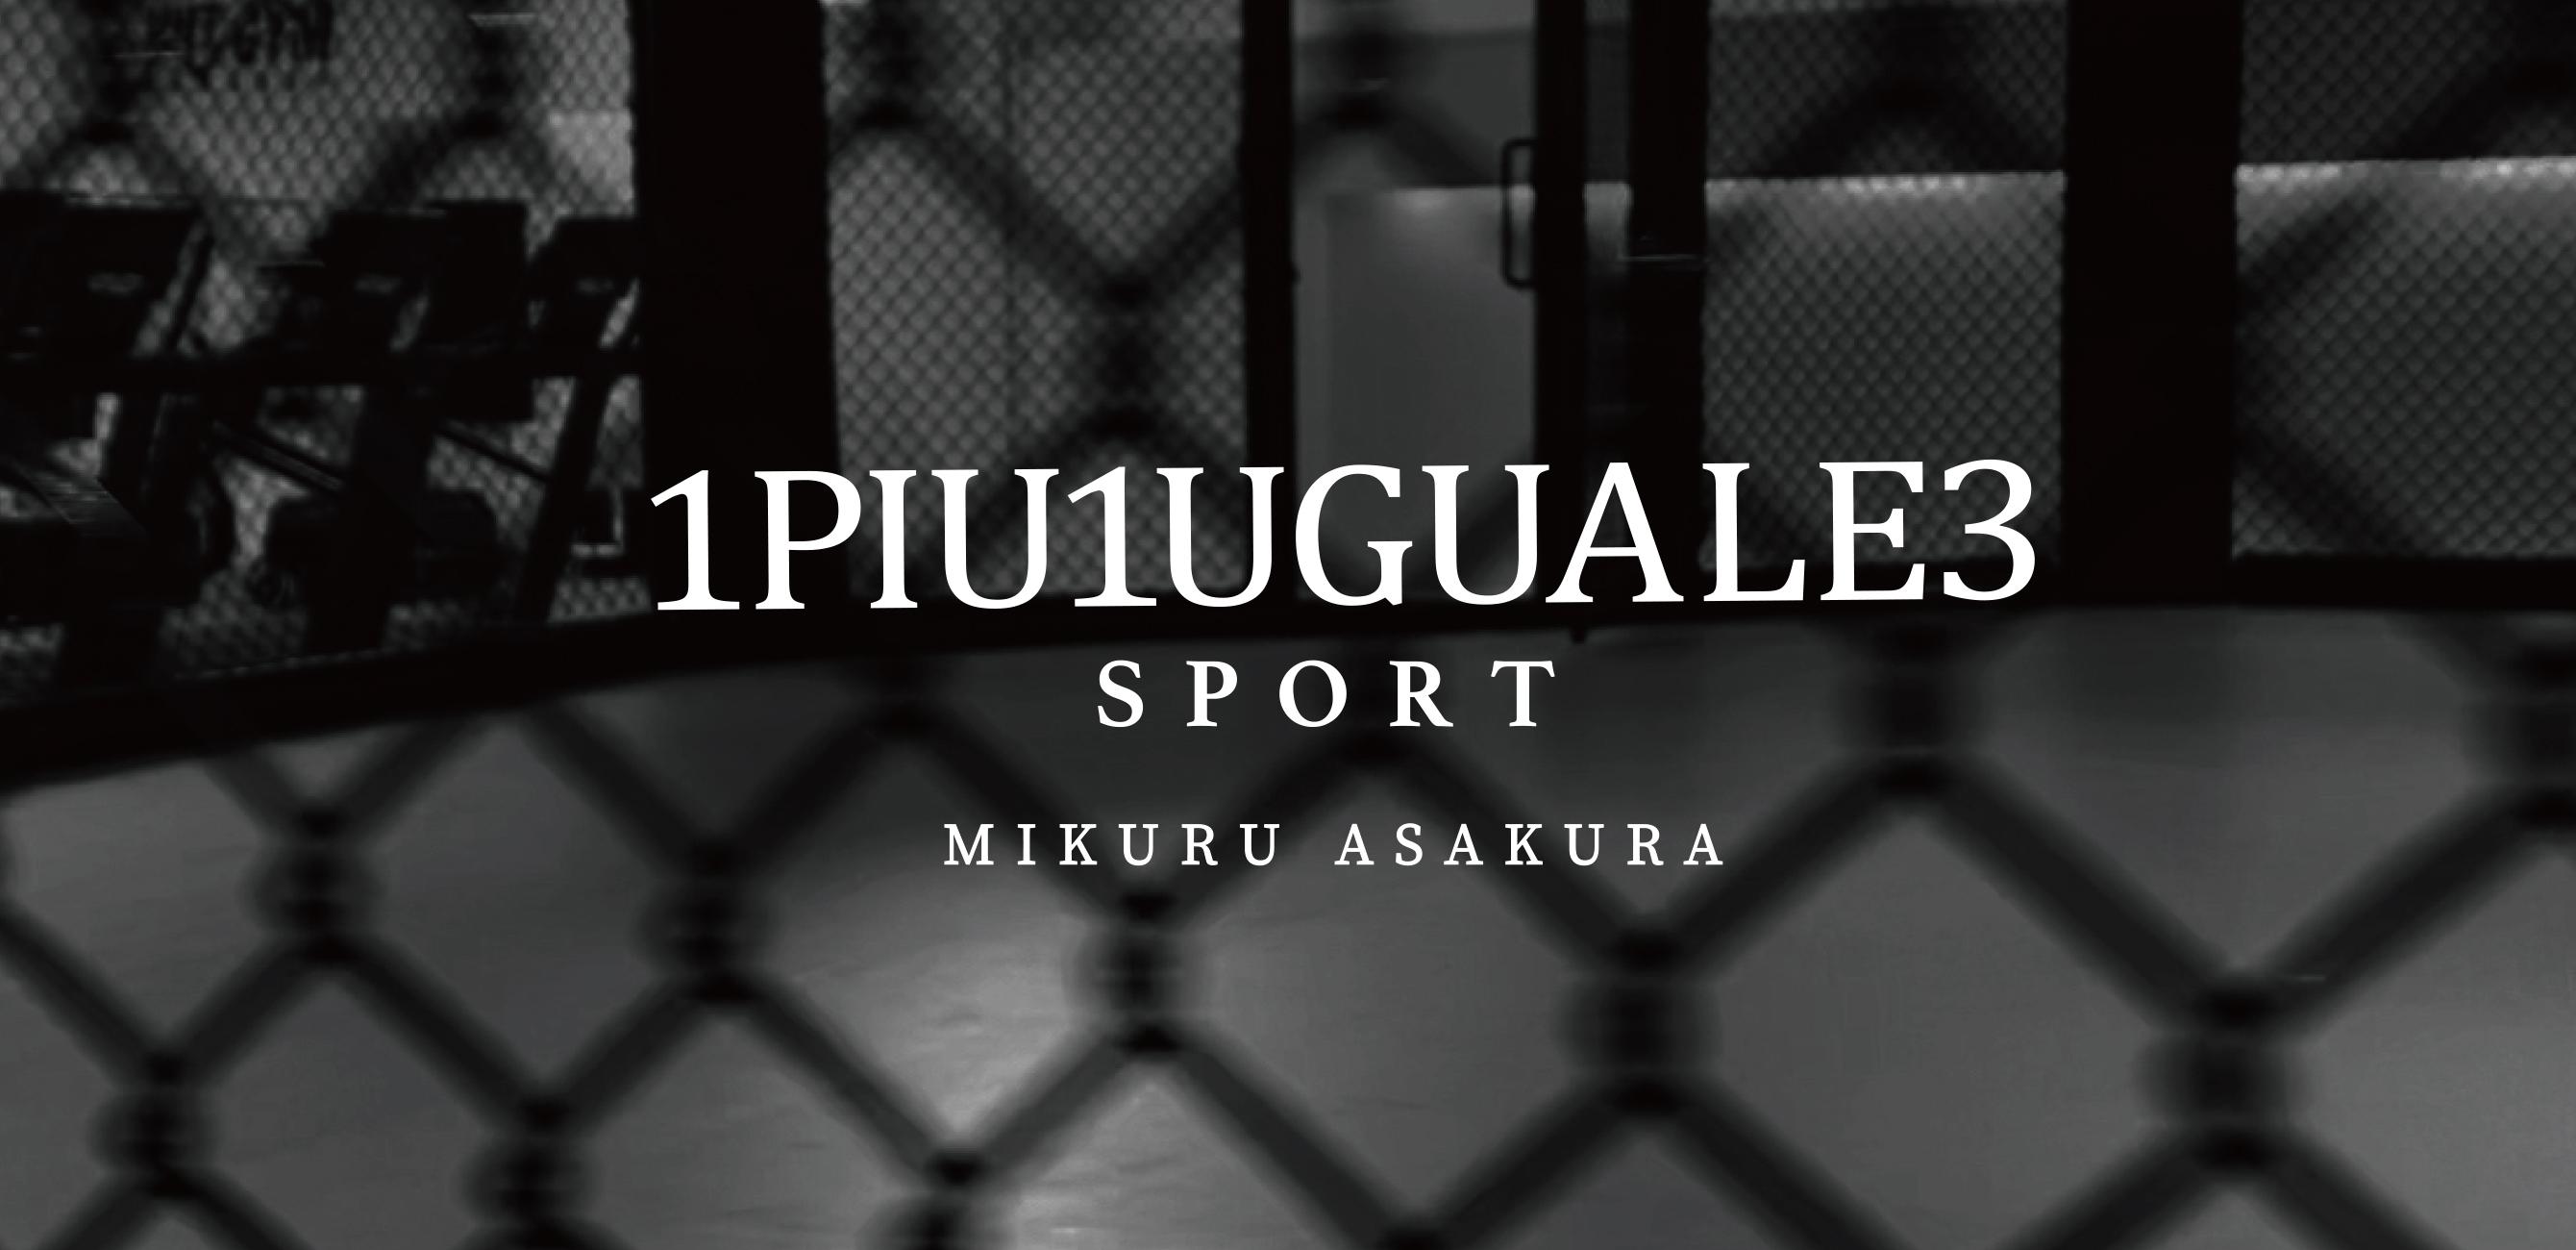 MIKURU ASAKURA